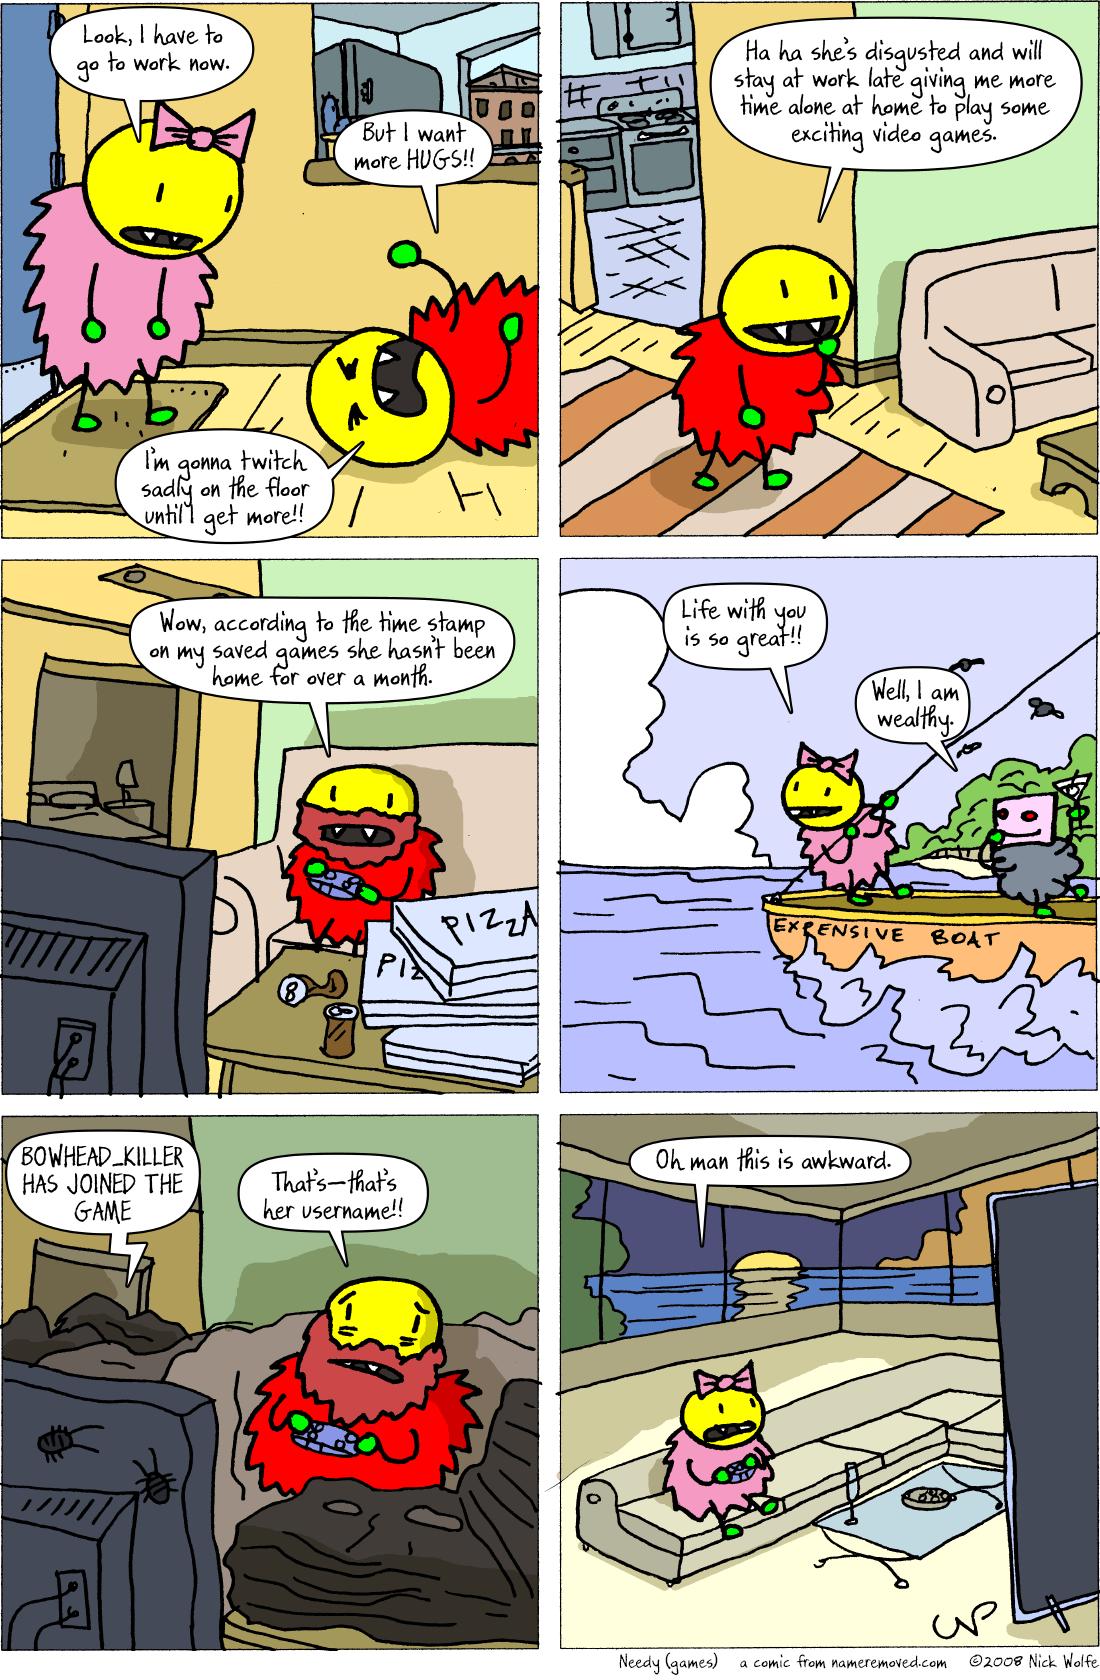 Needy (games)